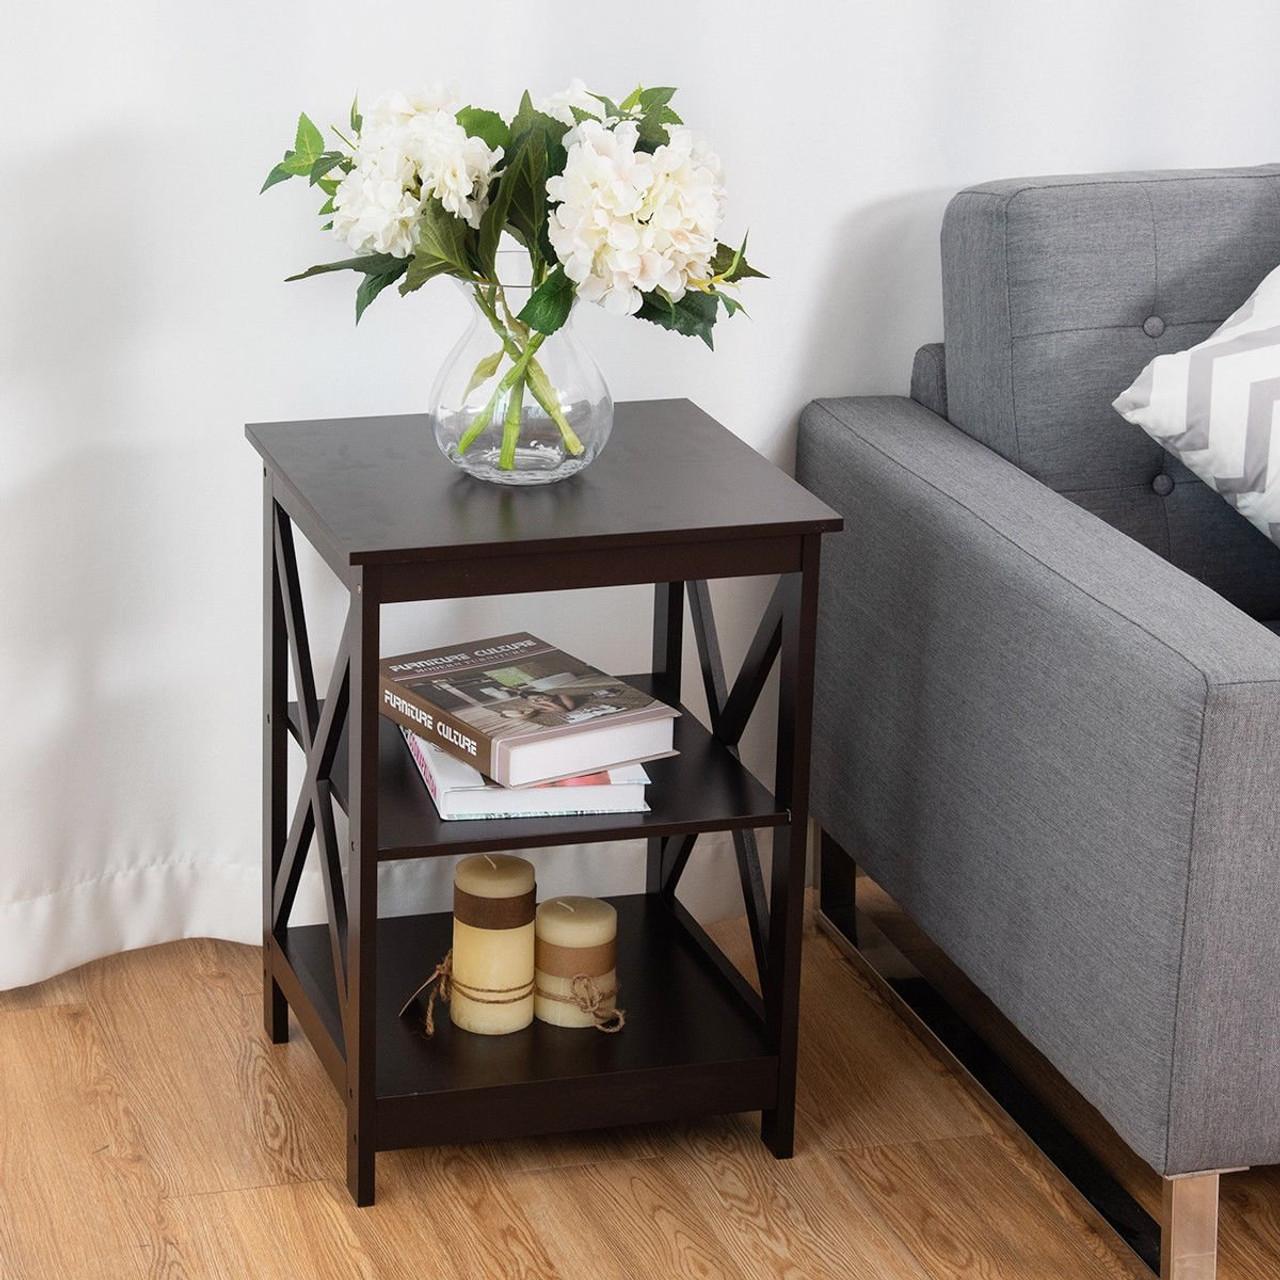 3 Tier Living Room Display Storage Shelf Nightstand Coffee Hw58944cf By Cw